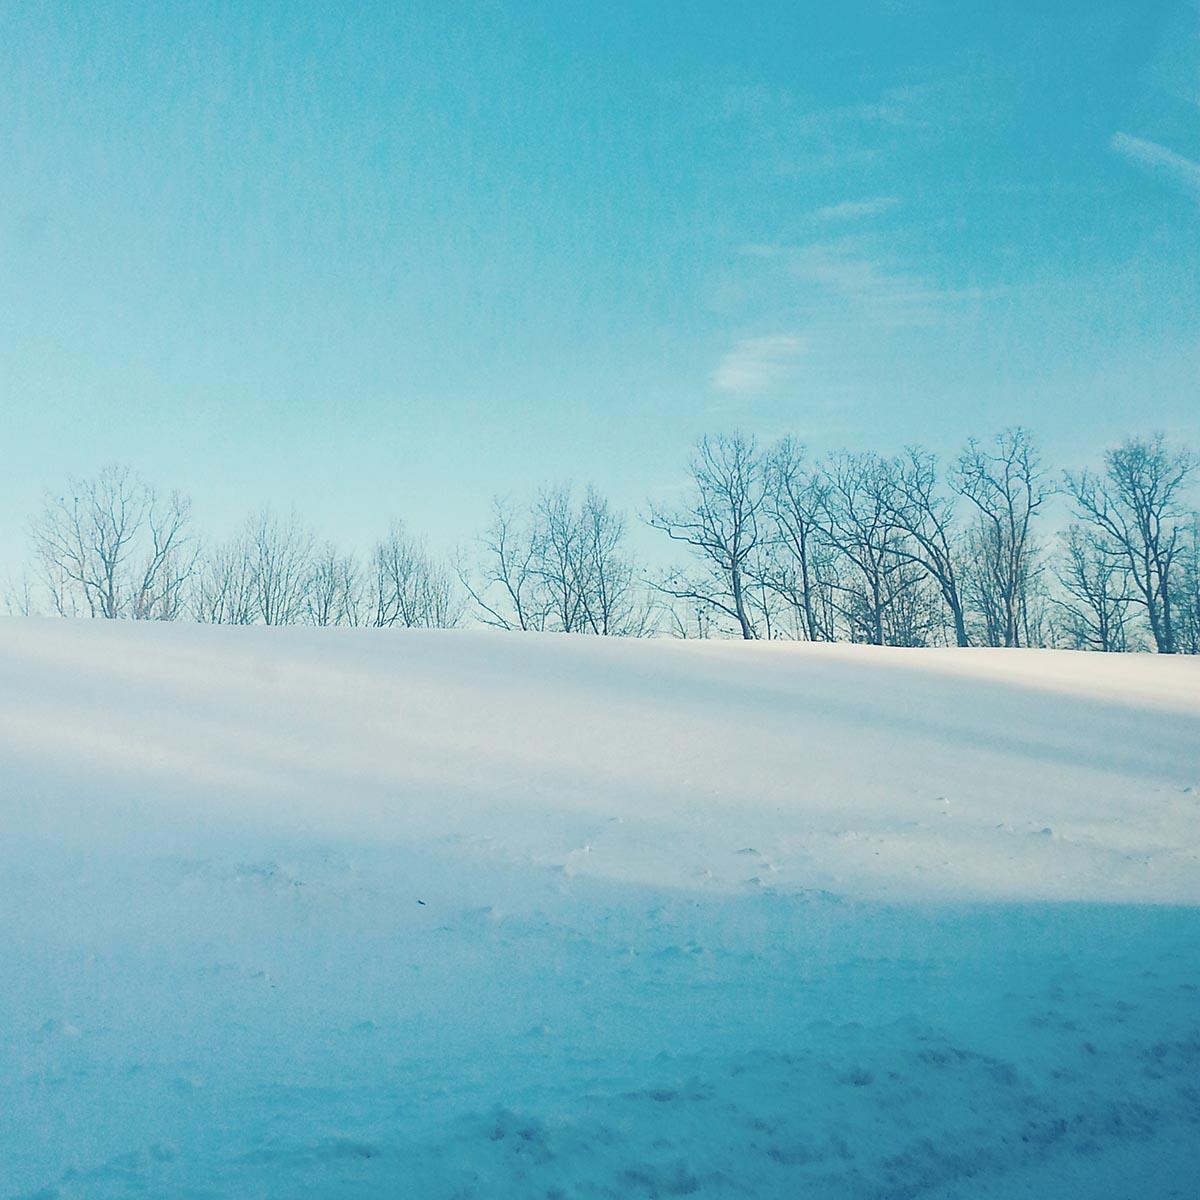 Free stock photo Winter snow scene with bare trees